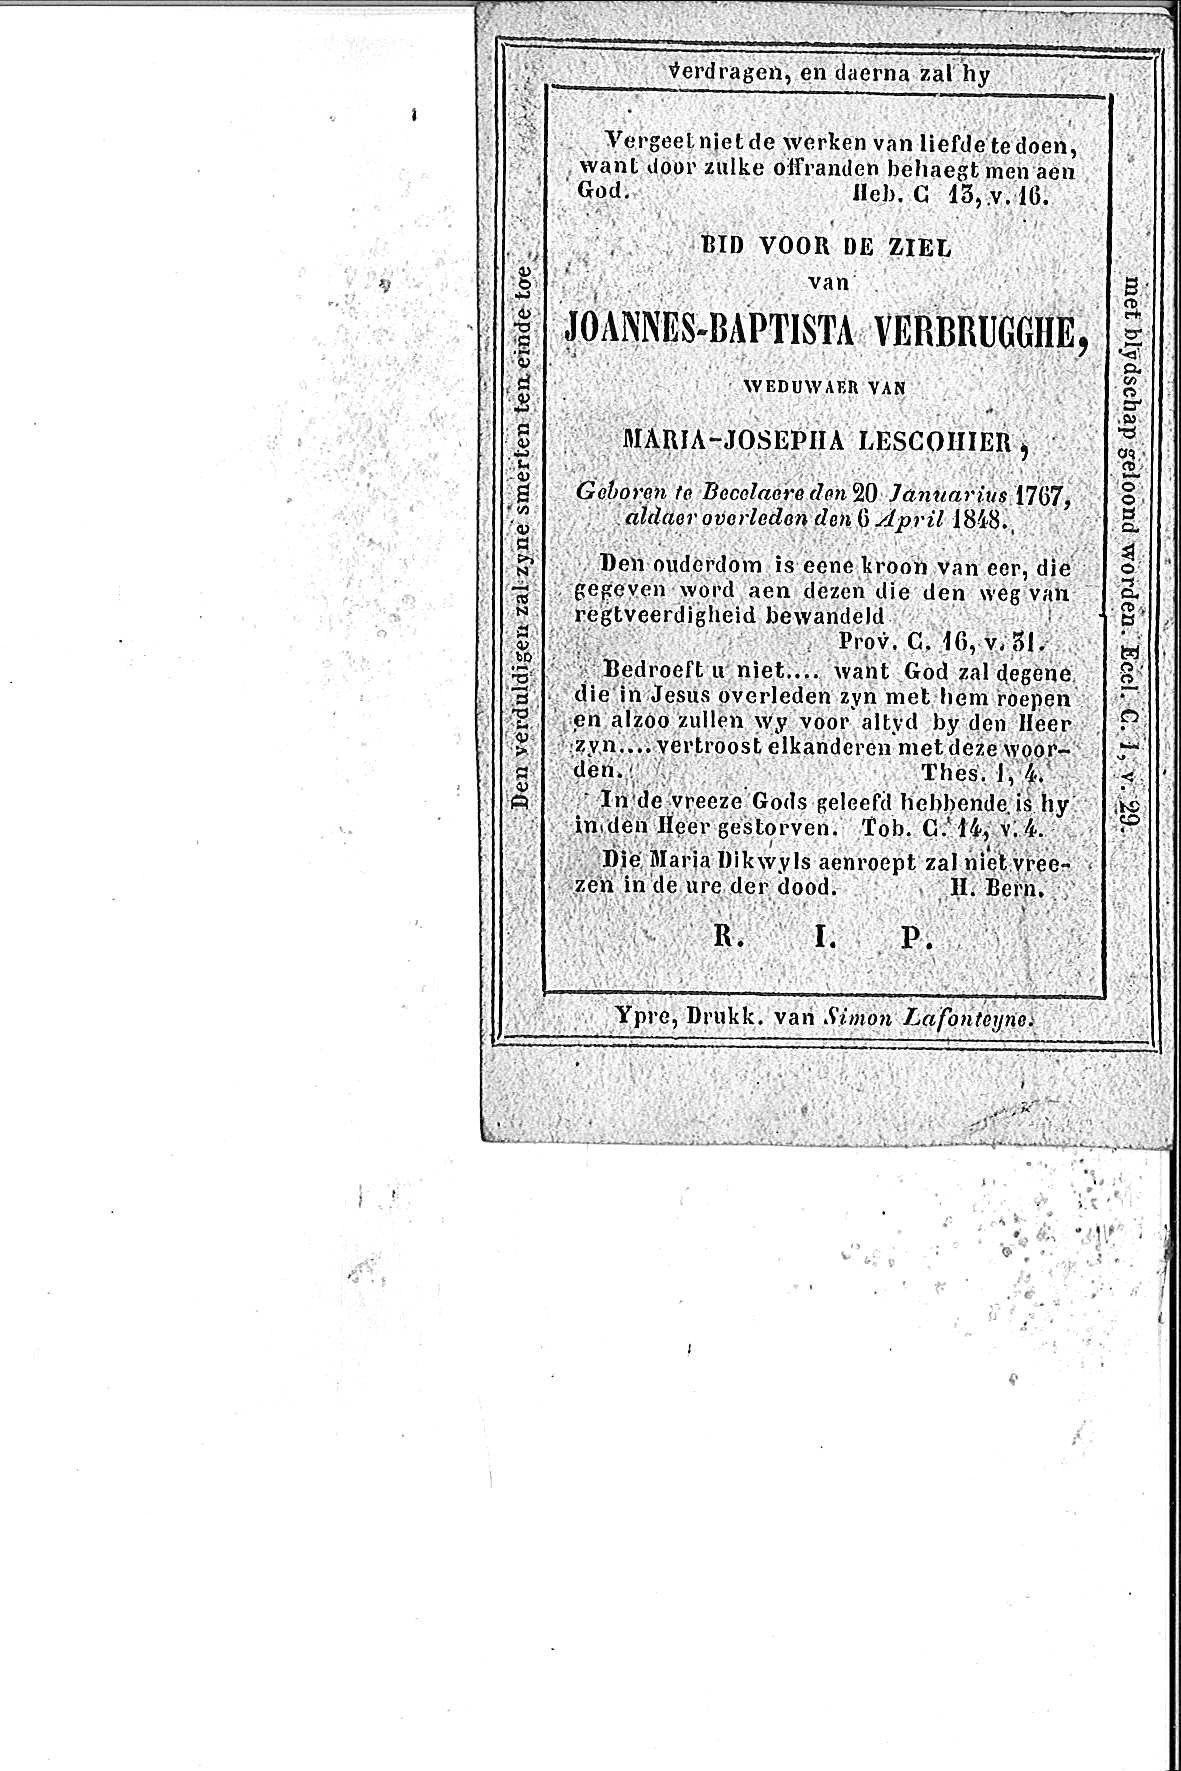 Joannes_Baptista(1848)20150812143220_00013.jpg